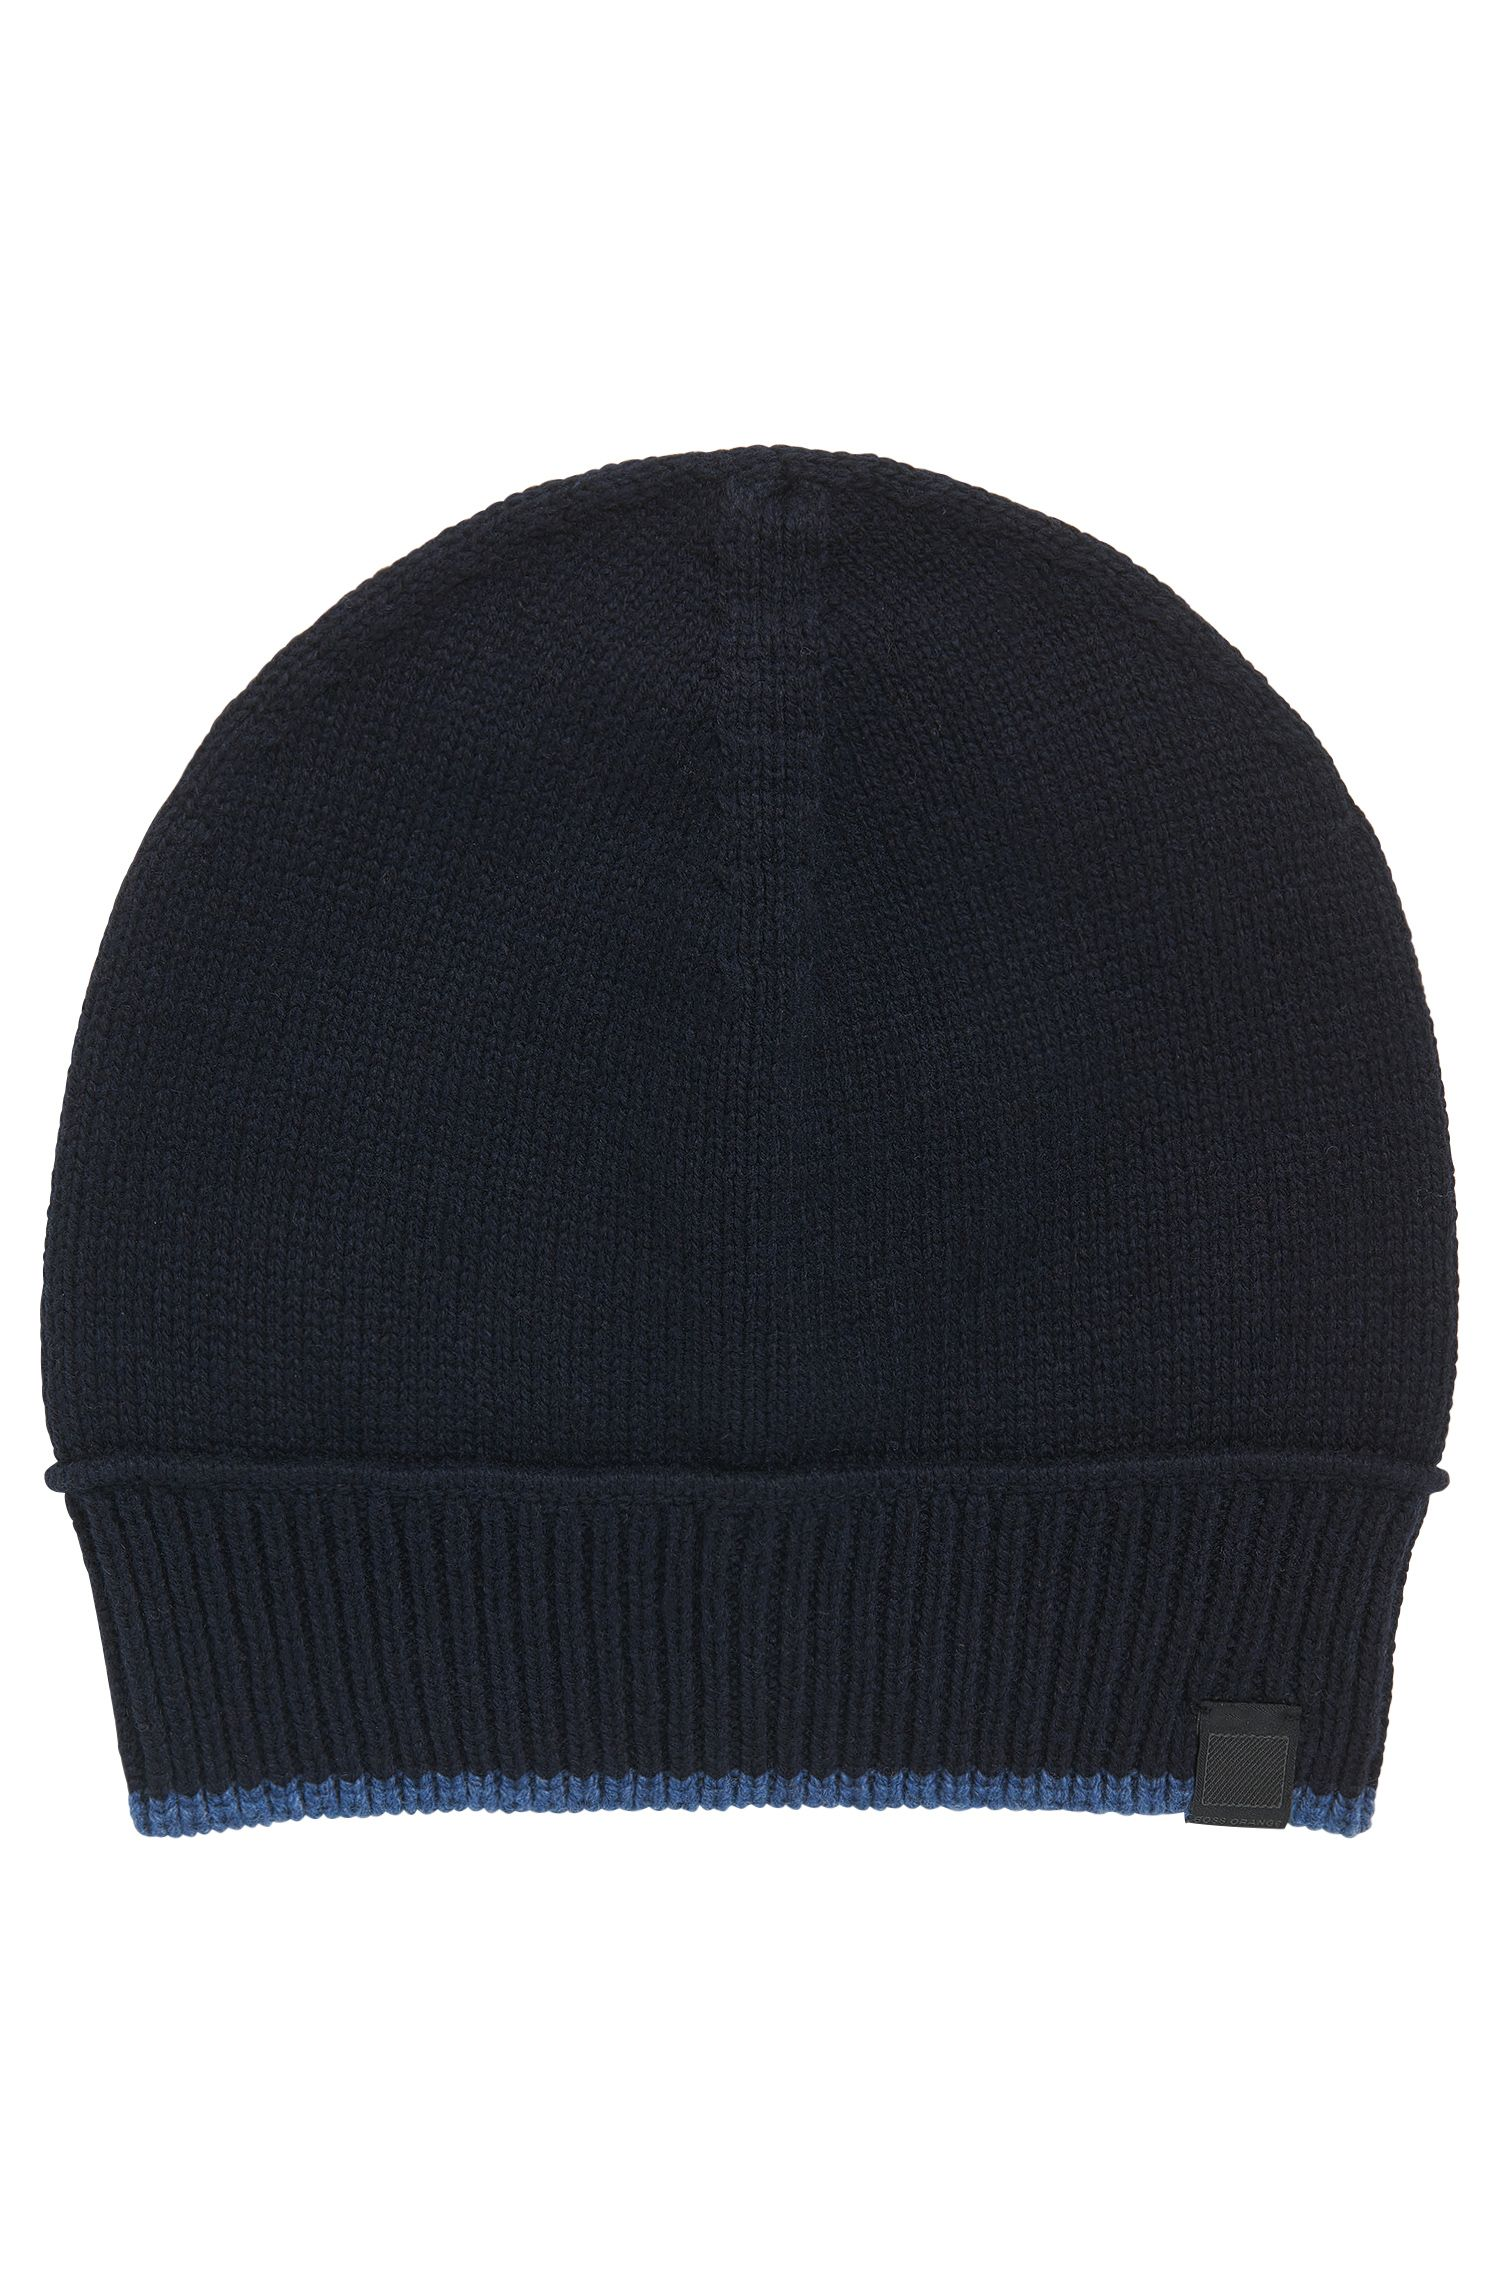 Contrast-piped hat in Italian yarn